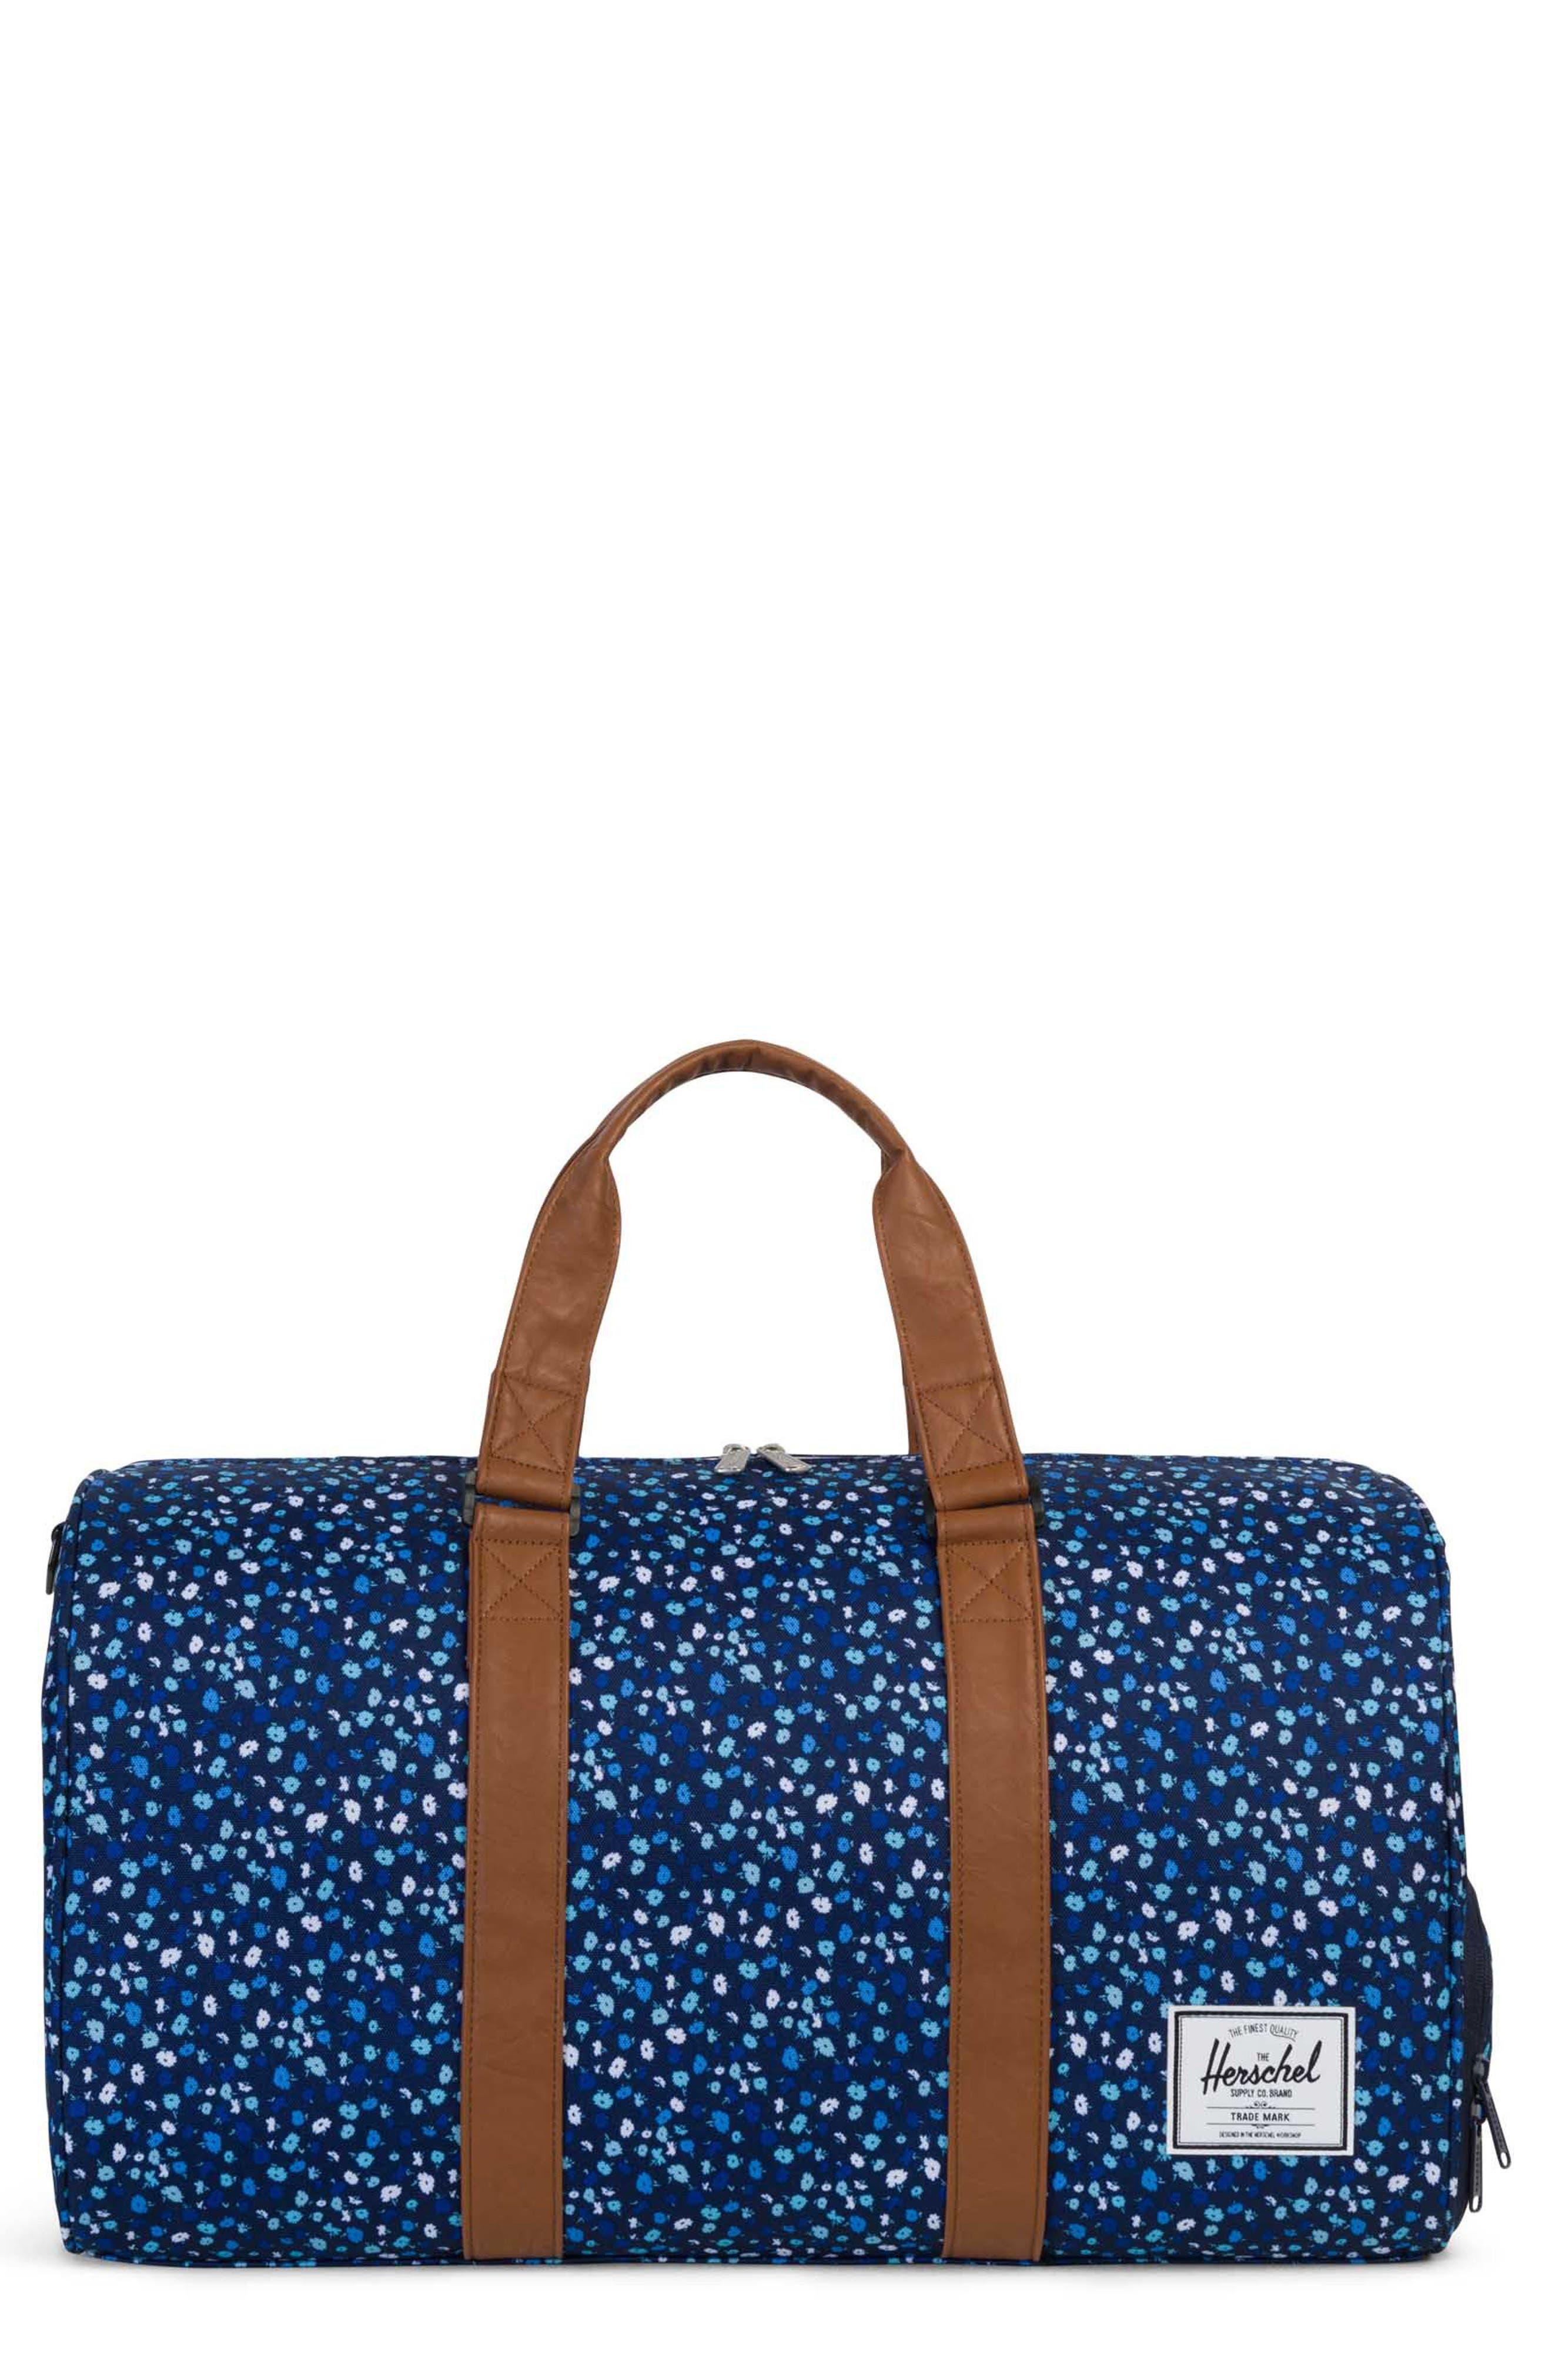 Novel Floral Pattern Duffel Bag,                         Main,                         color, 438